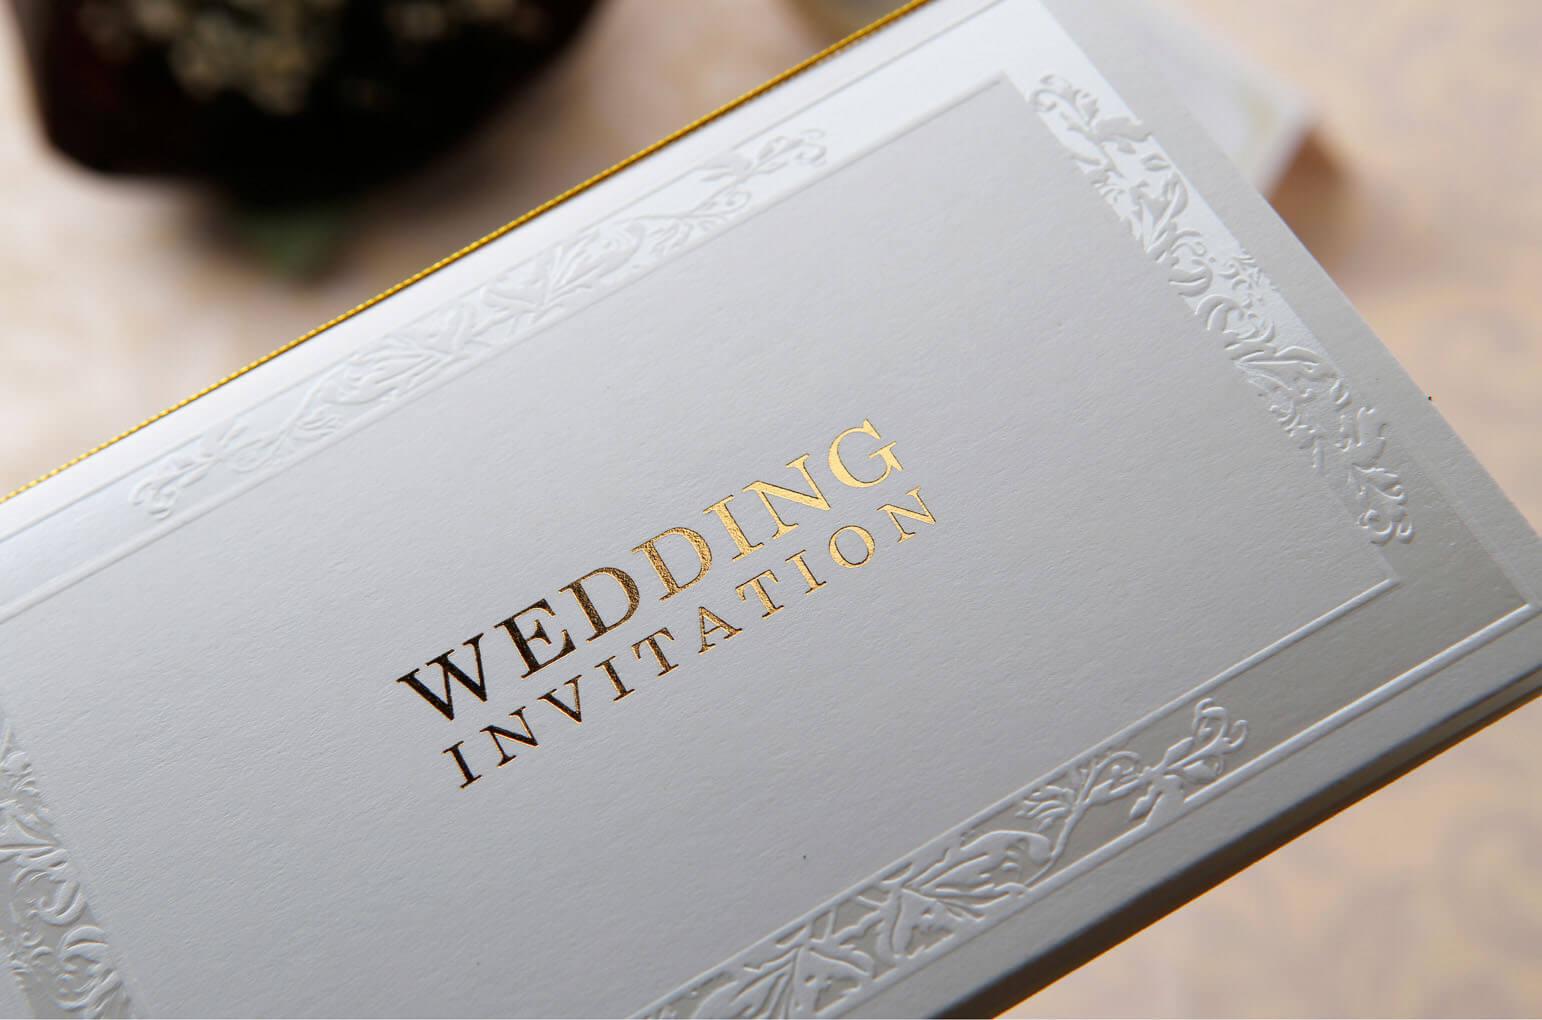 b58e2cb89074c 期間限定☆フラワーフレーム席次表50円キャンペーン♪- 結婚式招待状のbless